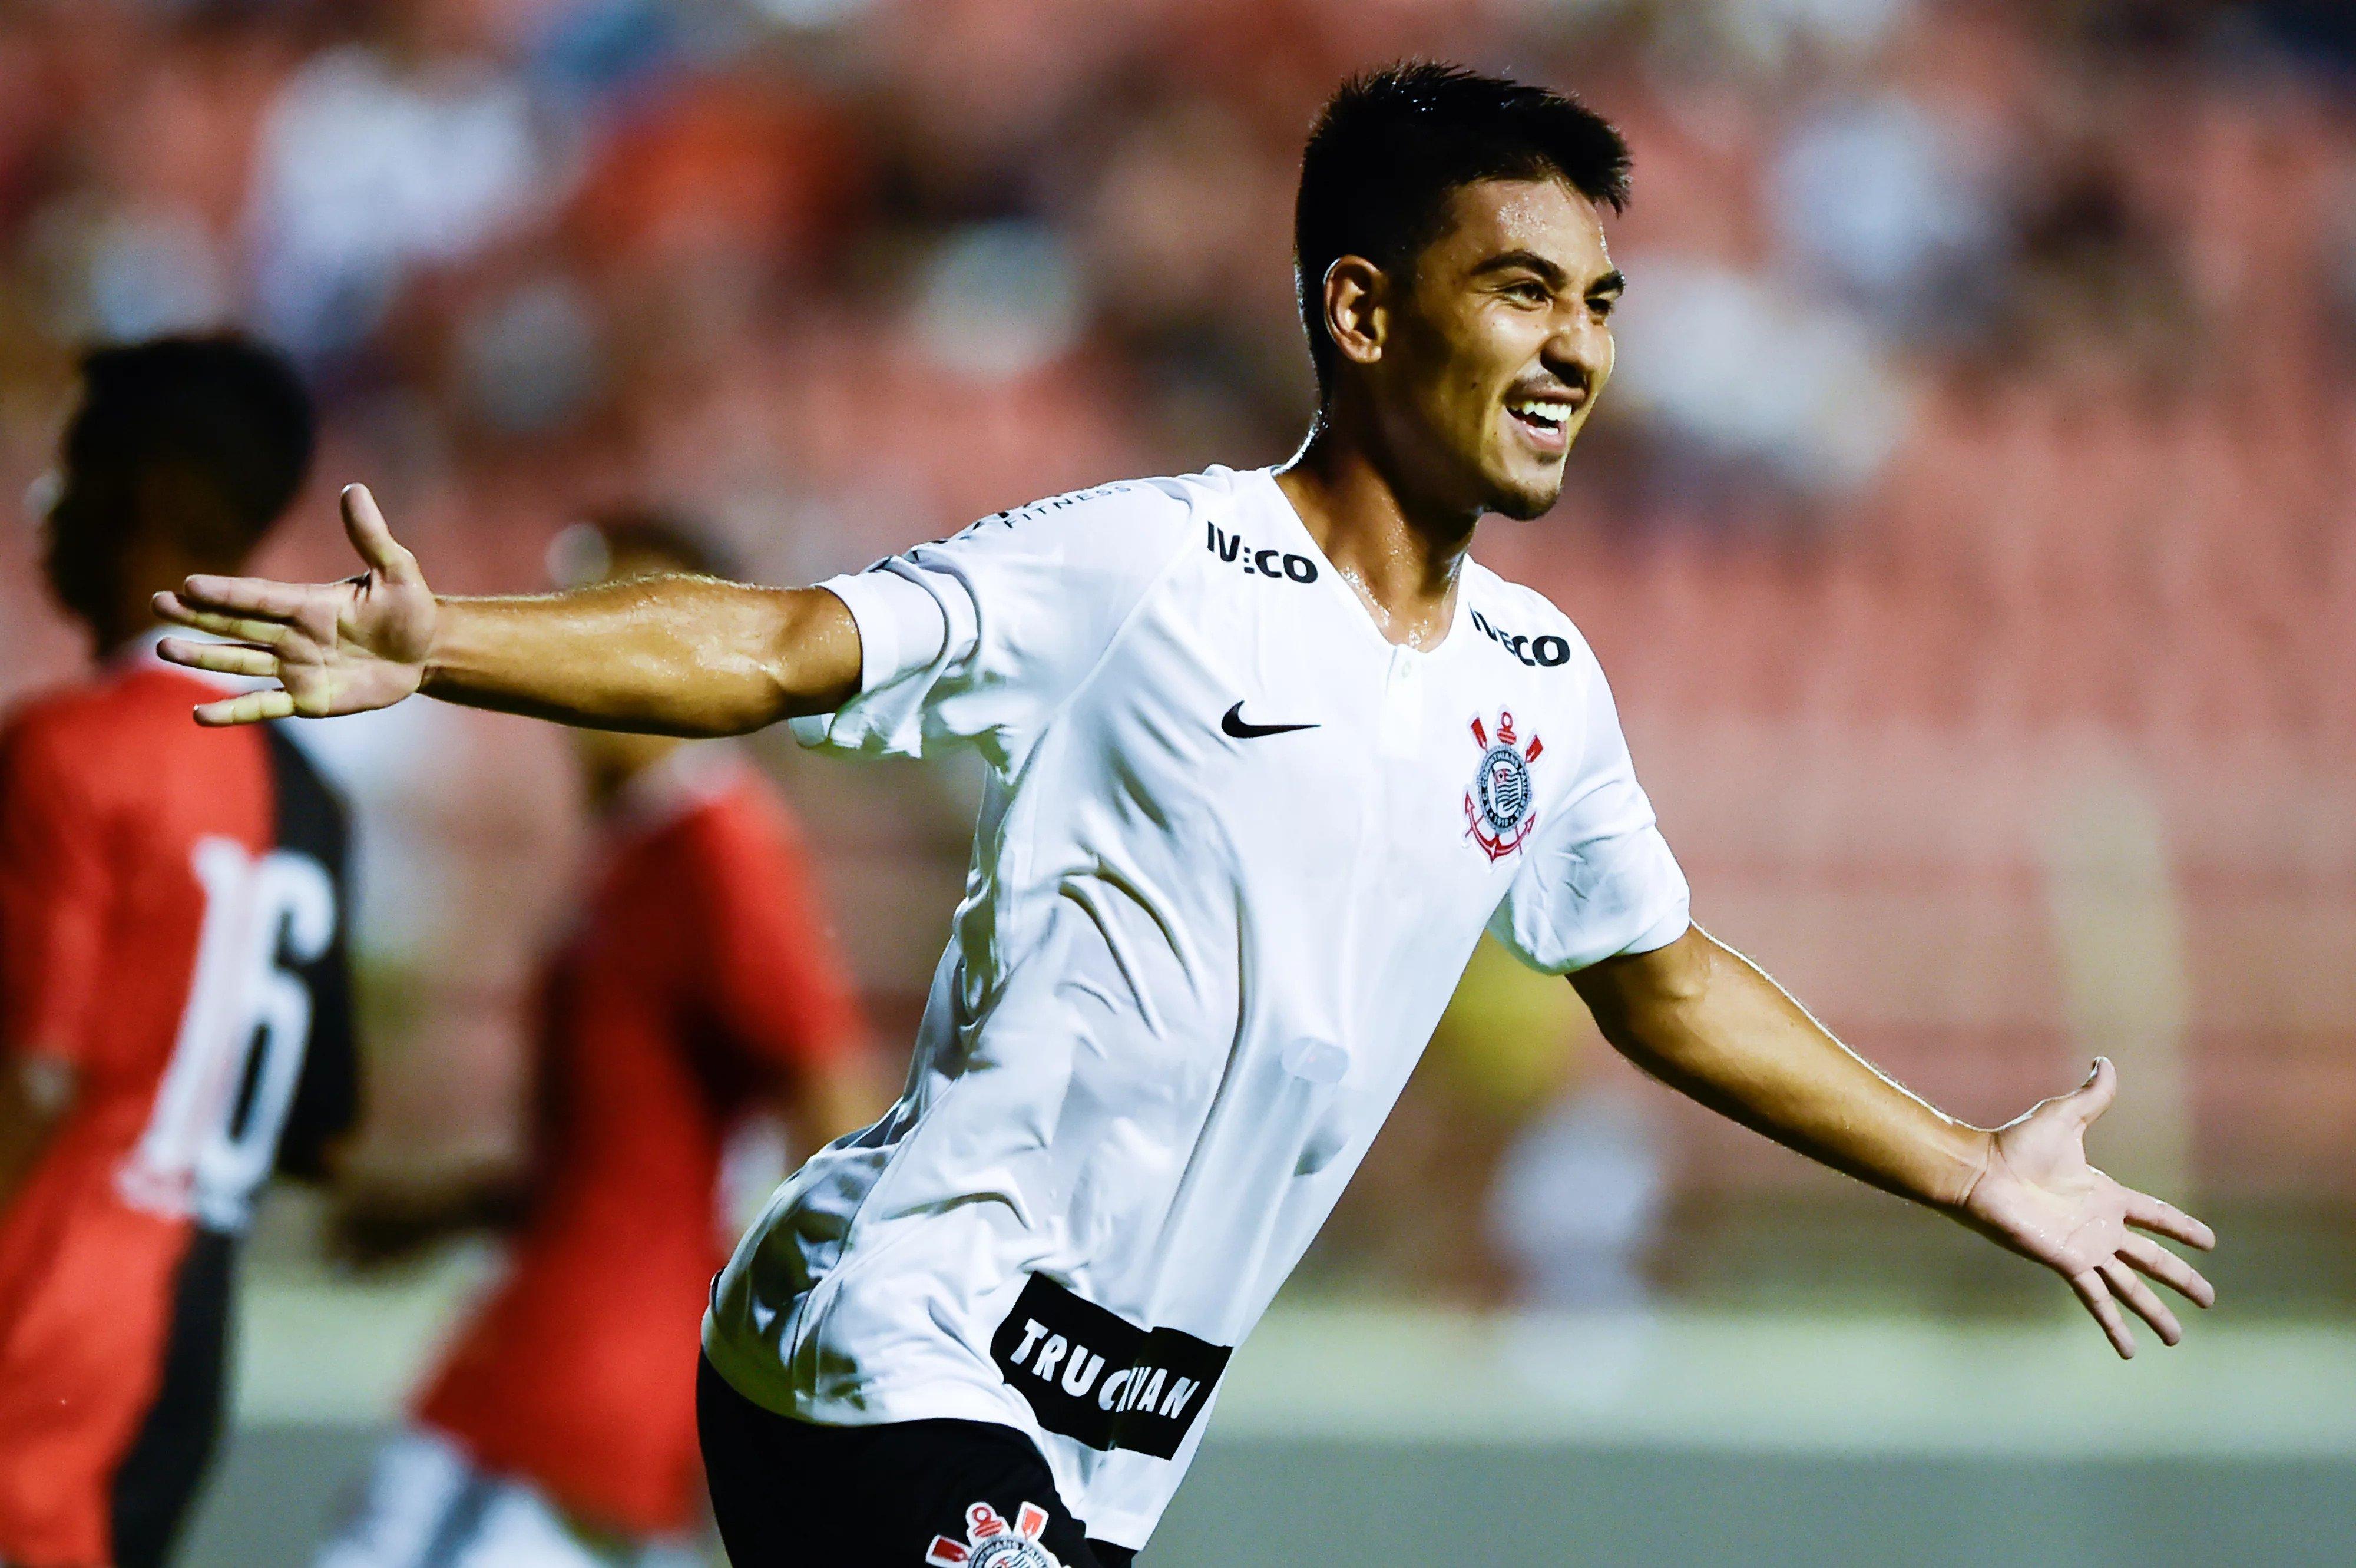 Fabicio Oya - Corinthians - Copa São Paulo